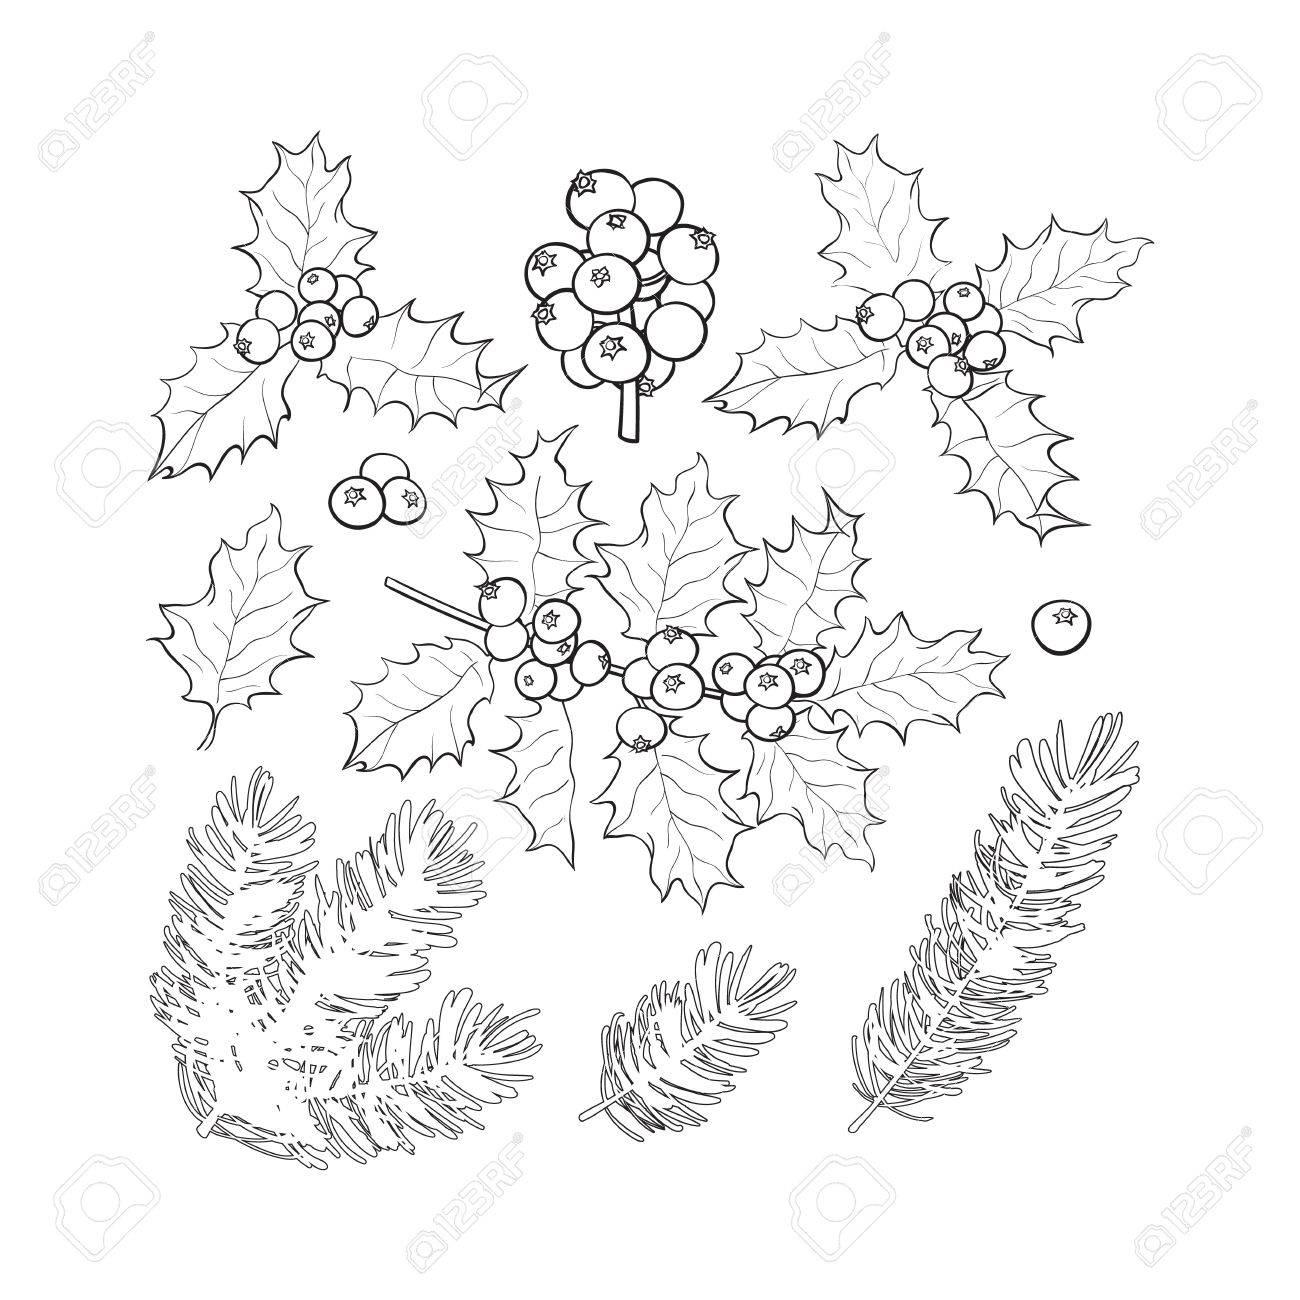 set of black and white fir tree and mistletoe branches with leaves  set of black and white fir tree and mistletoe branches with leaves and berries christmas